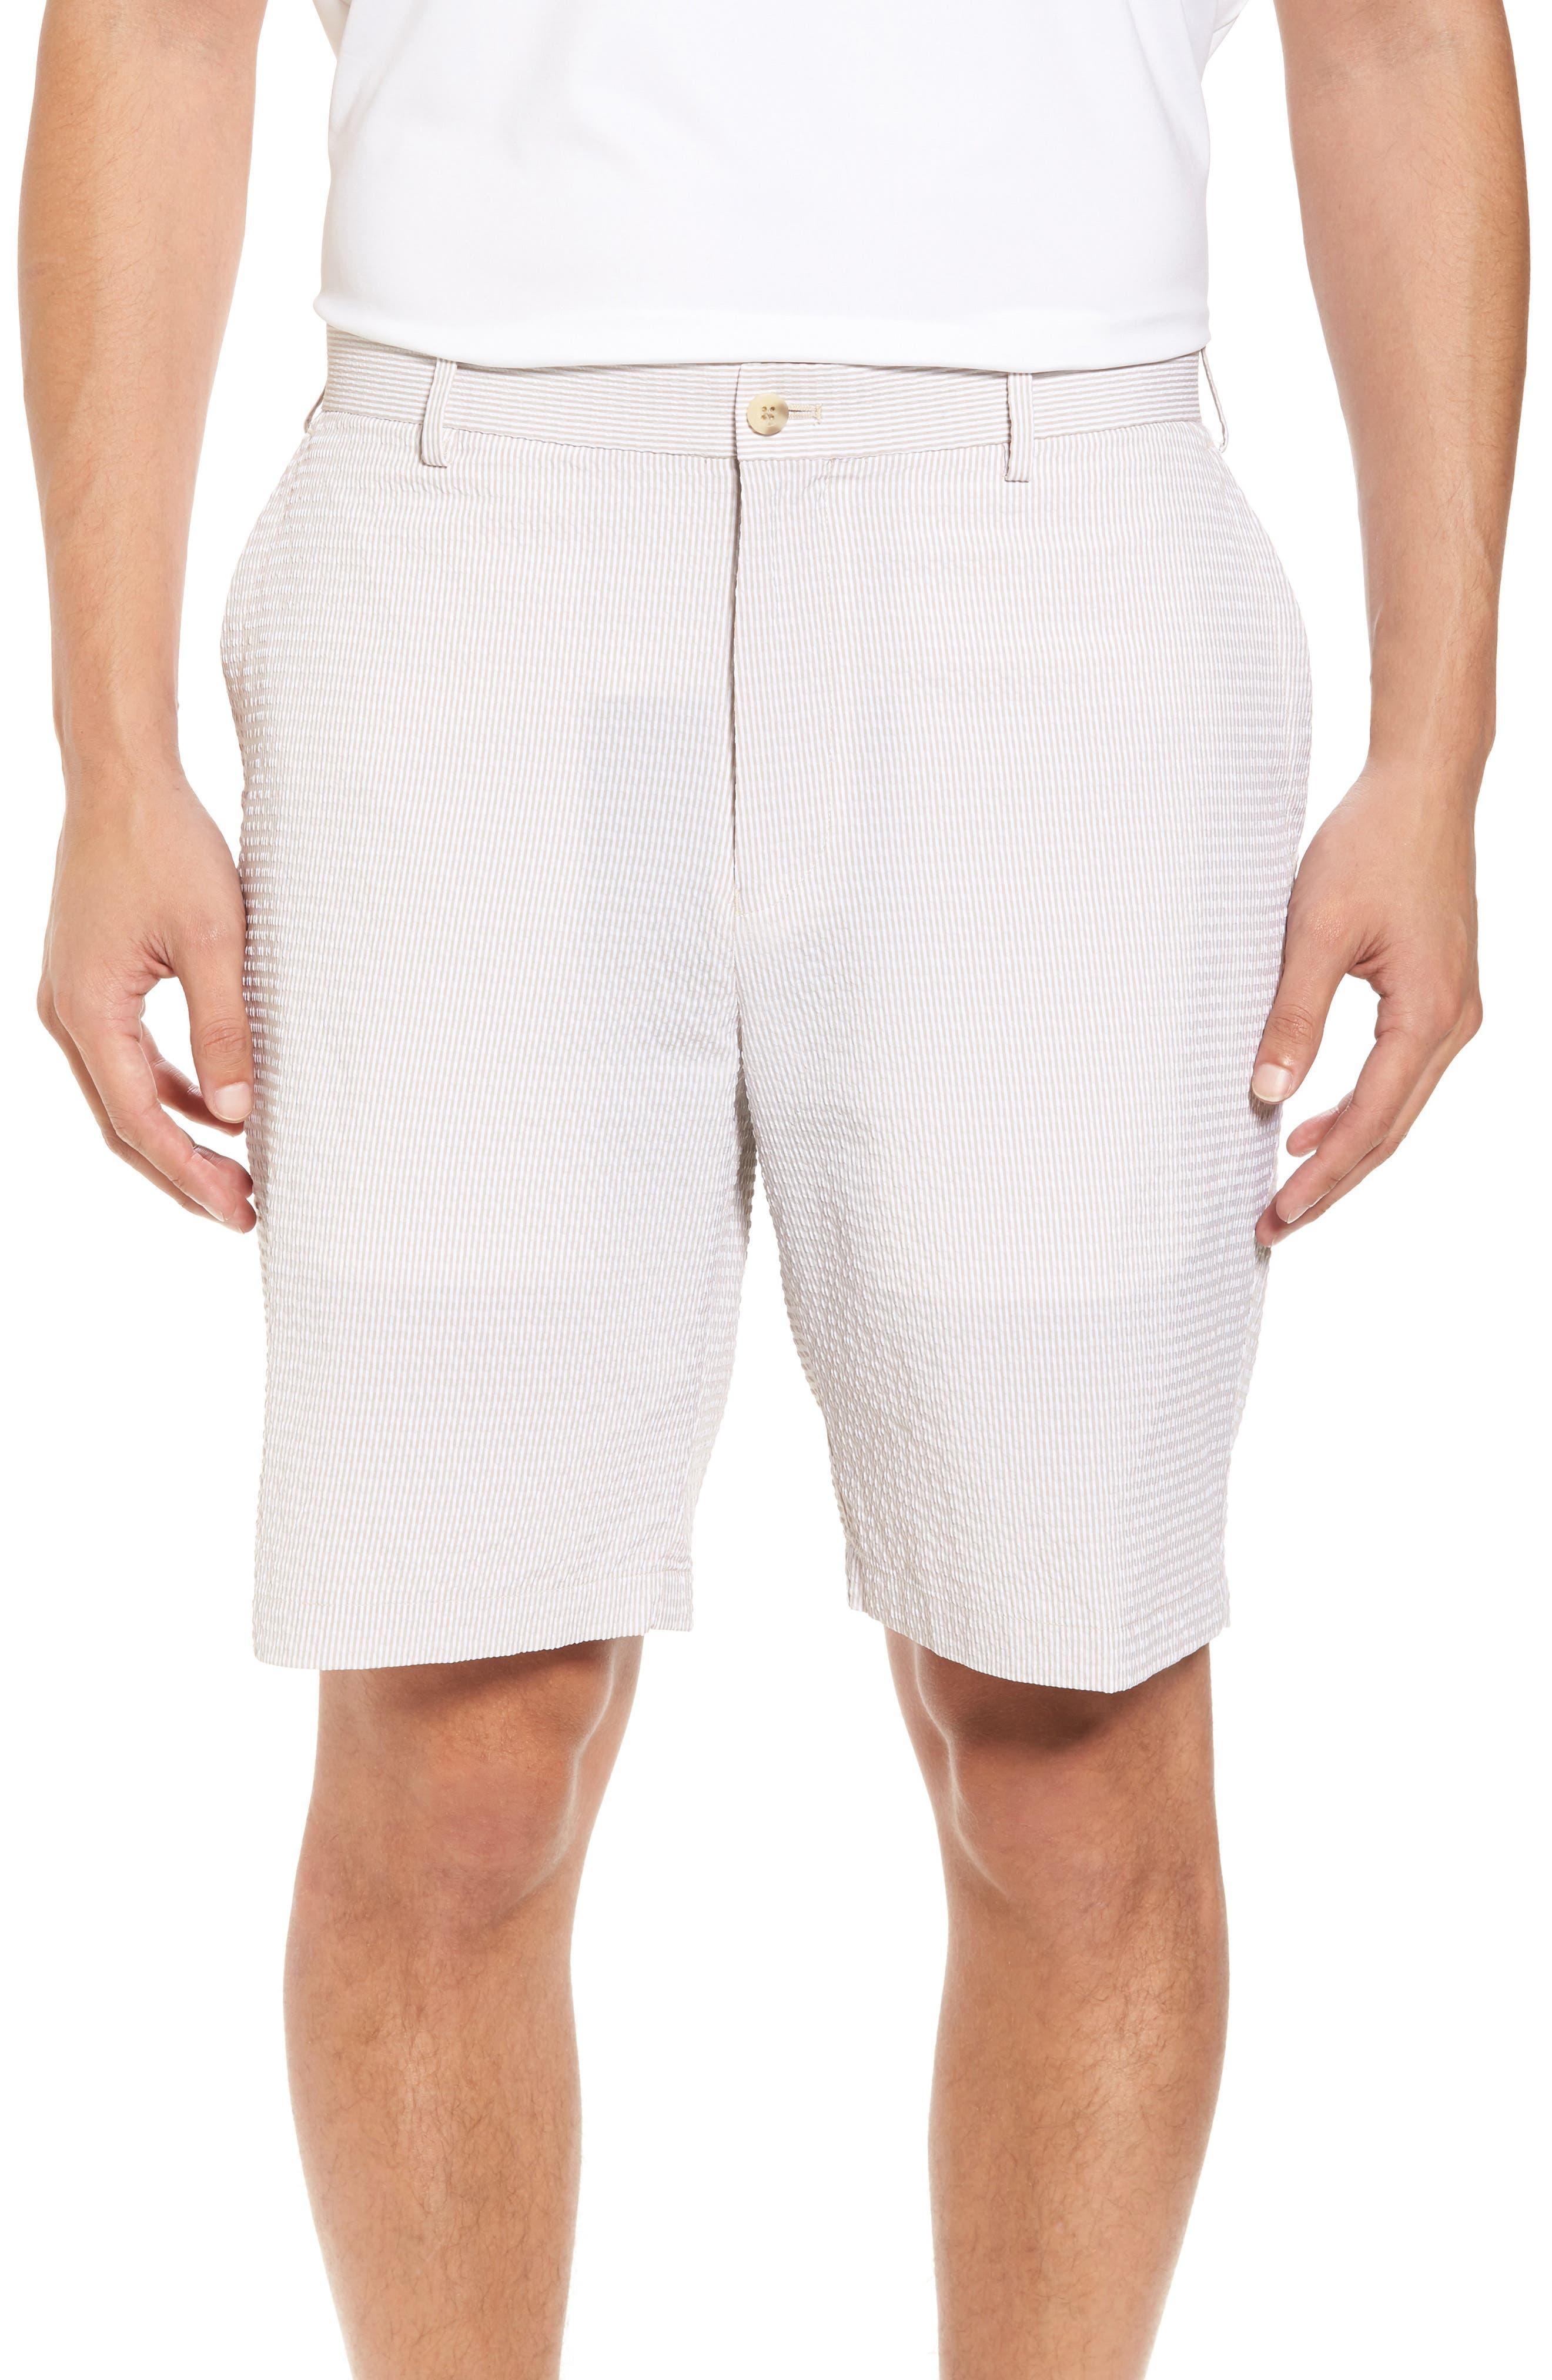 Apex Pinstripe Seersucker Shorts,                         Main,                         color, 260